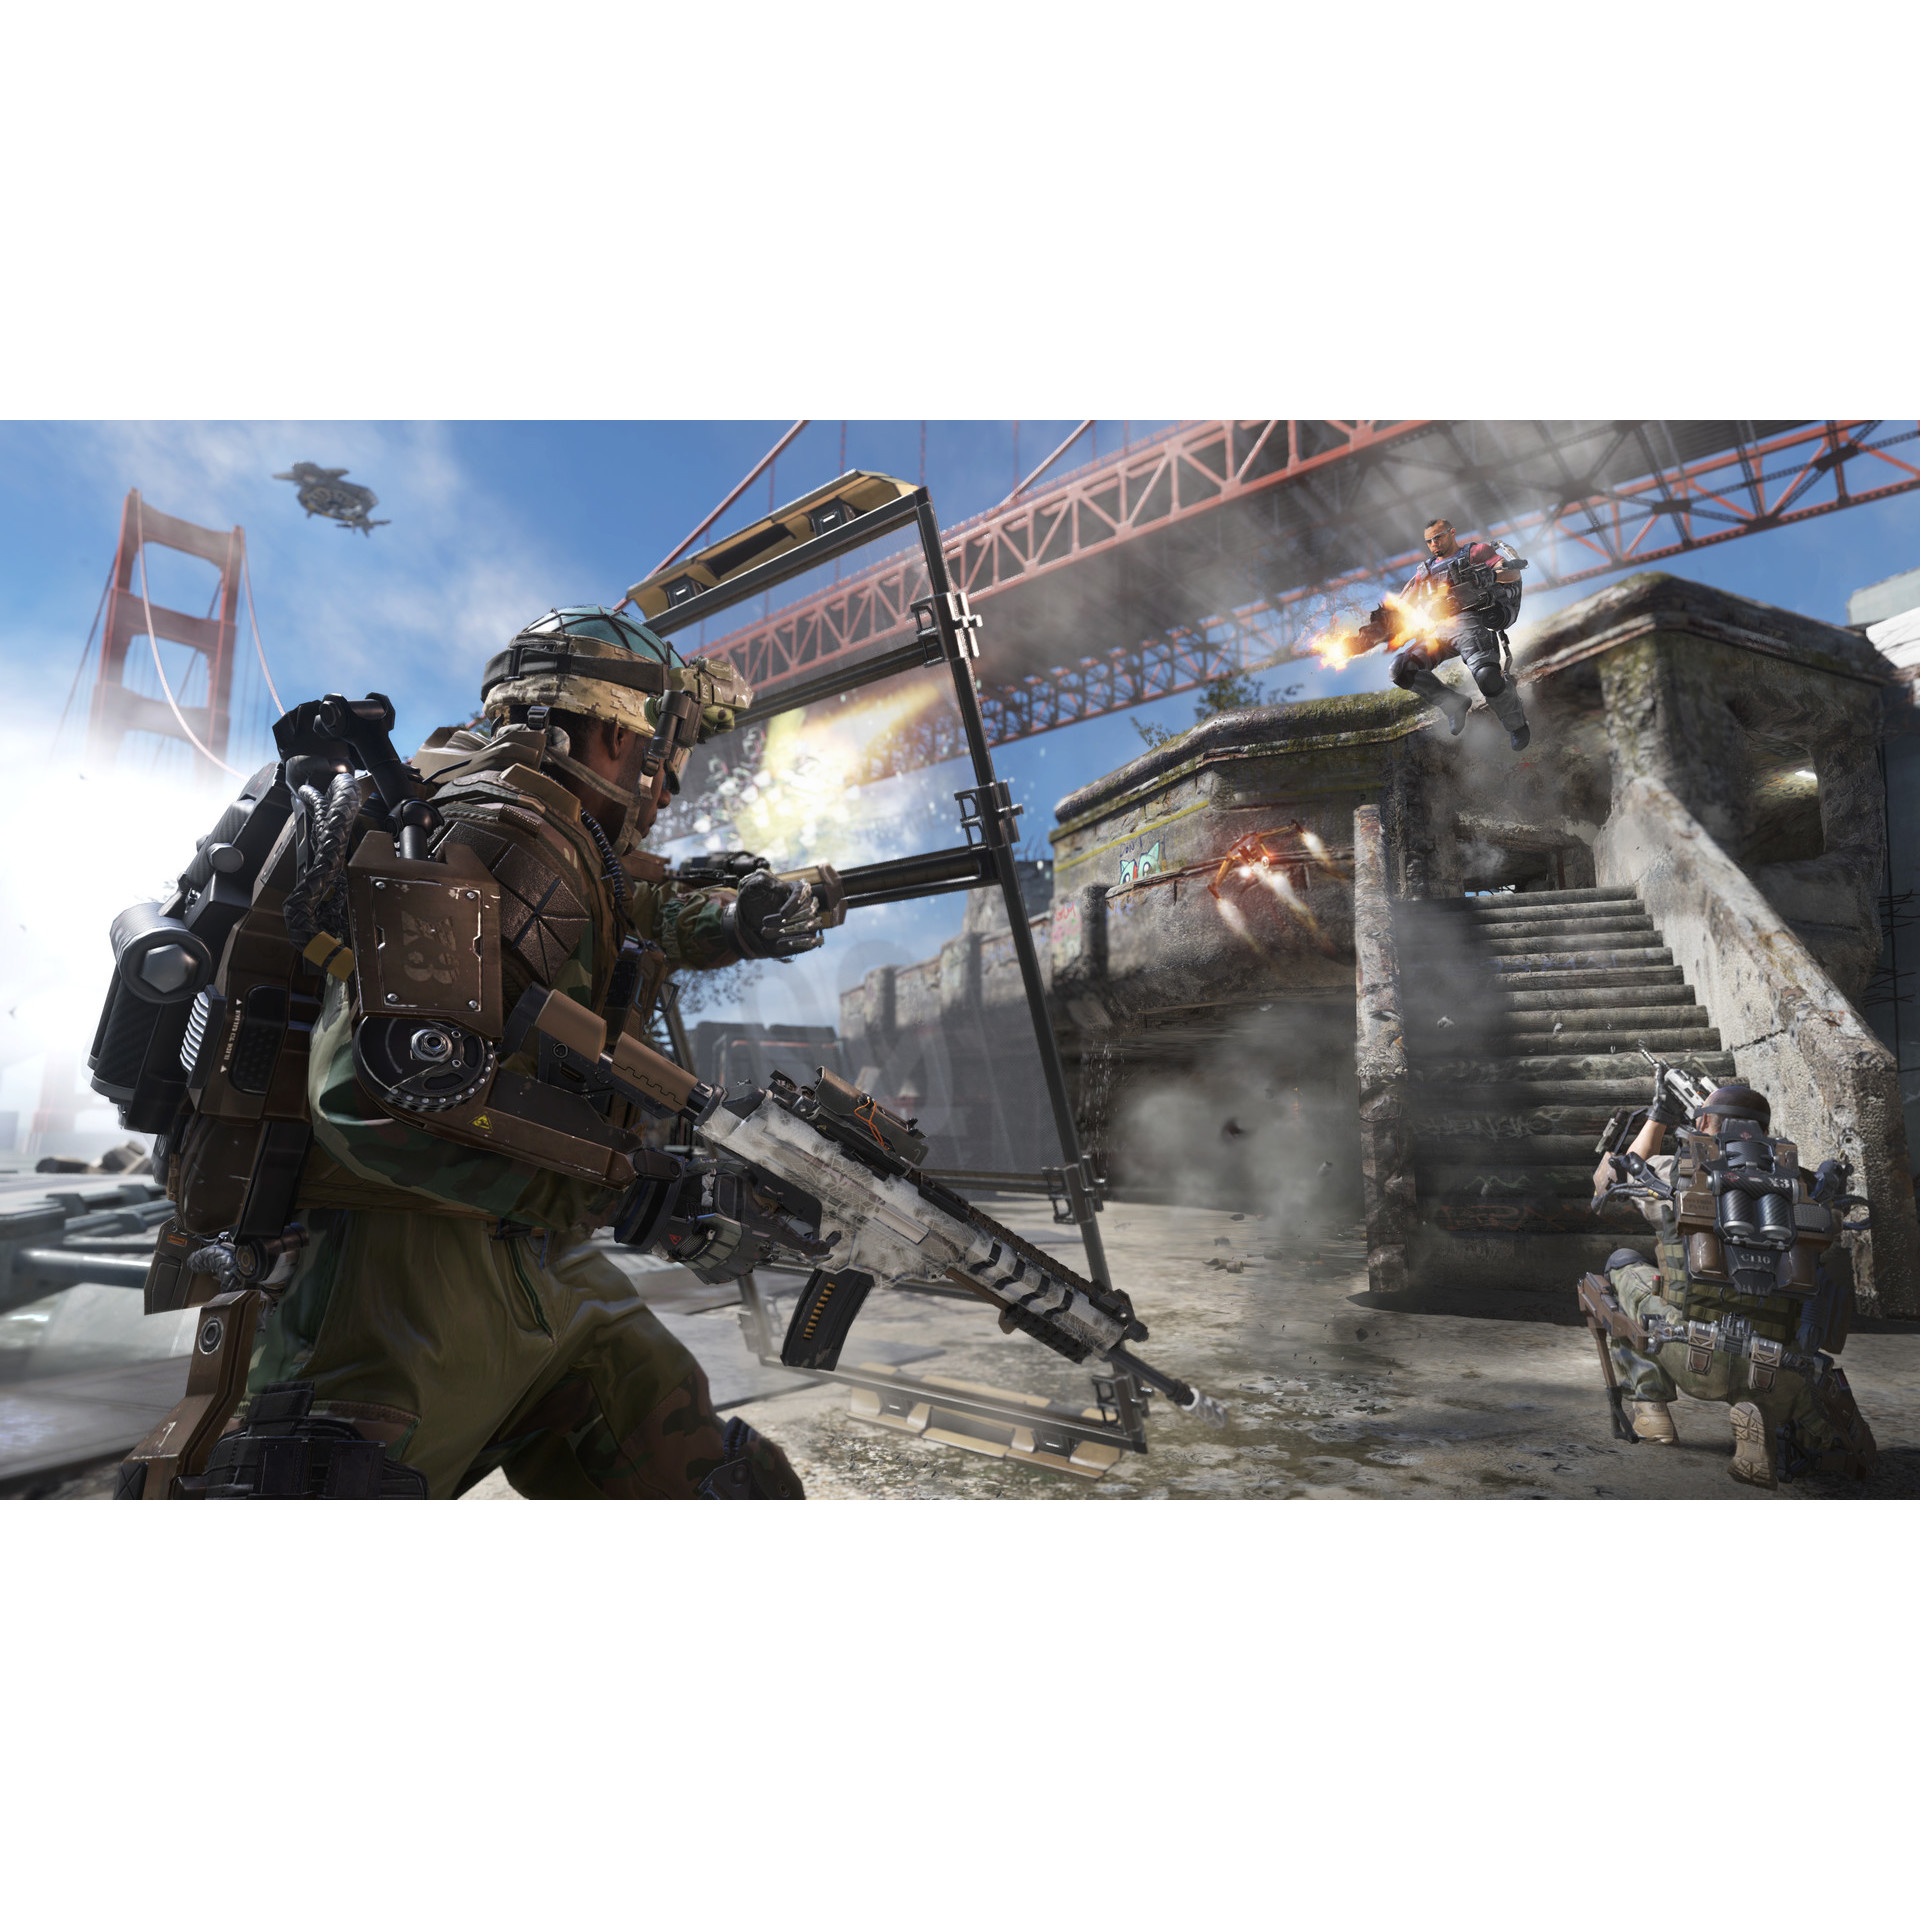 Joc Call of Duty Advanced Warfare Steam Key Pentru Calculator 2